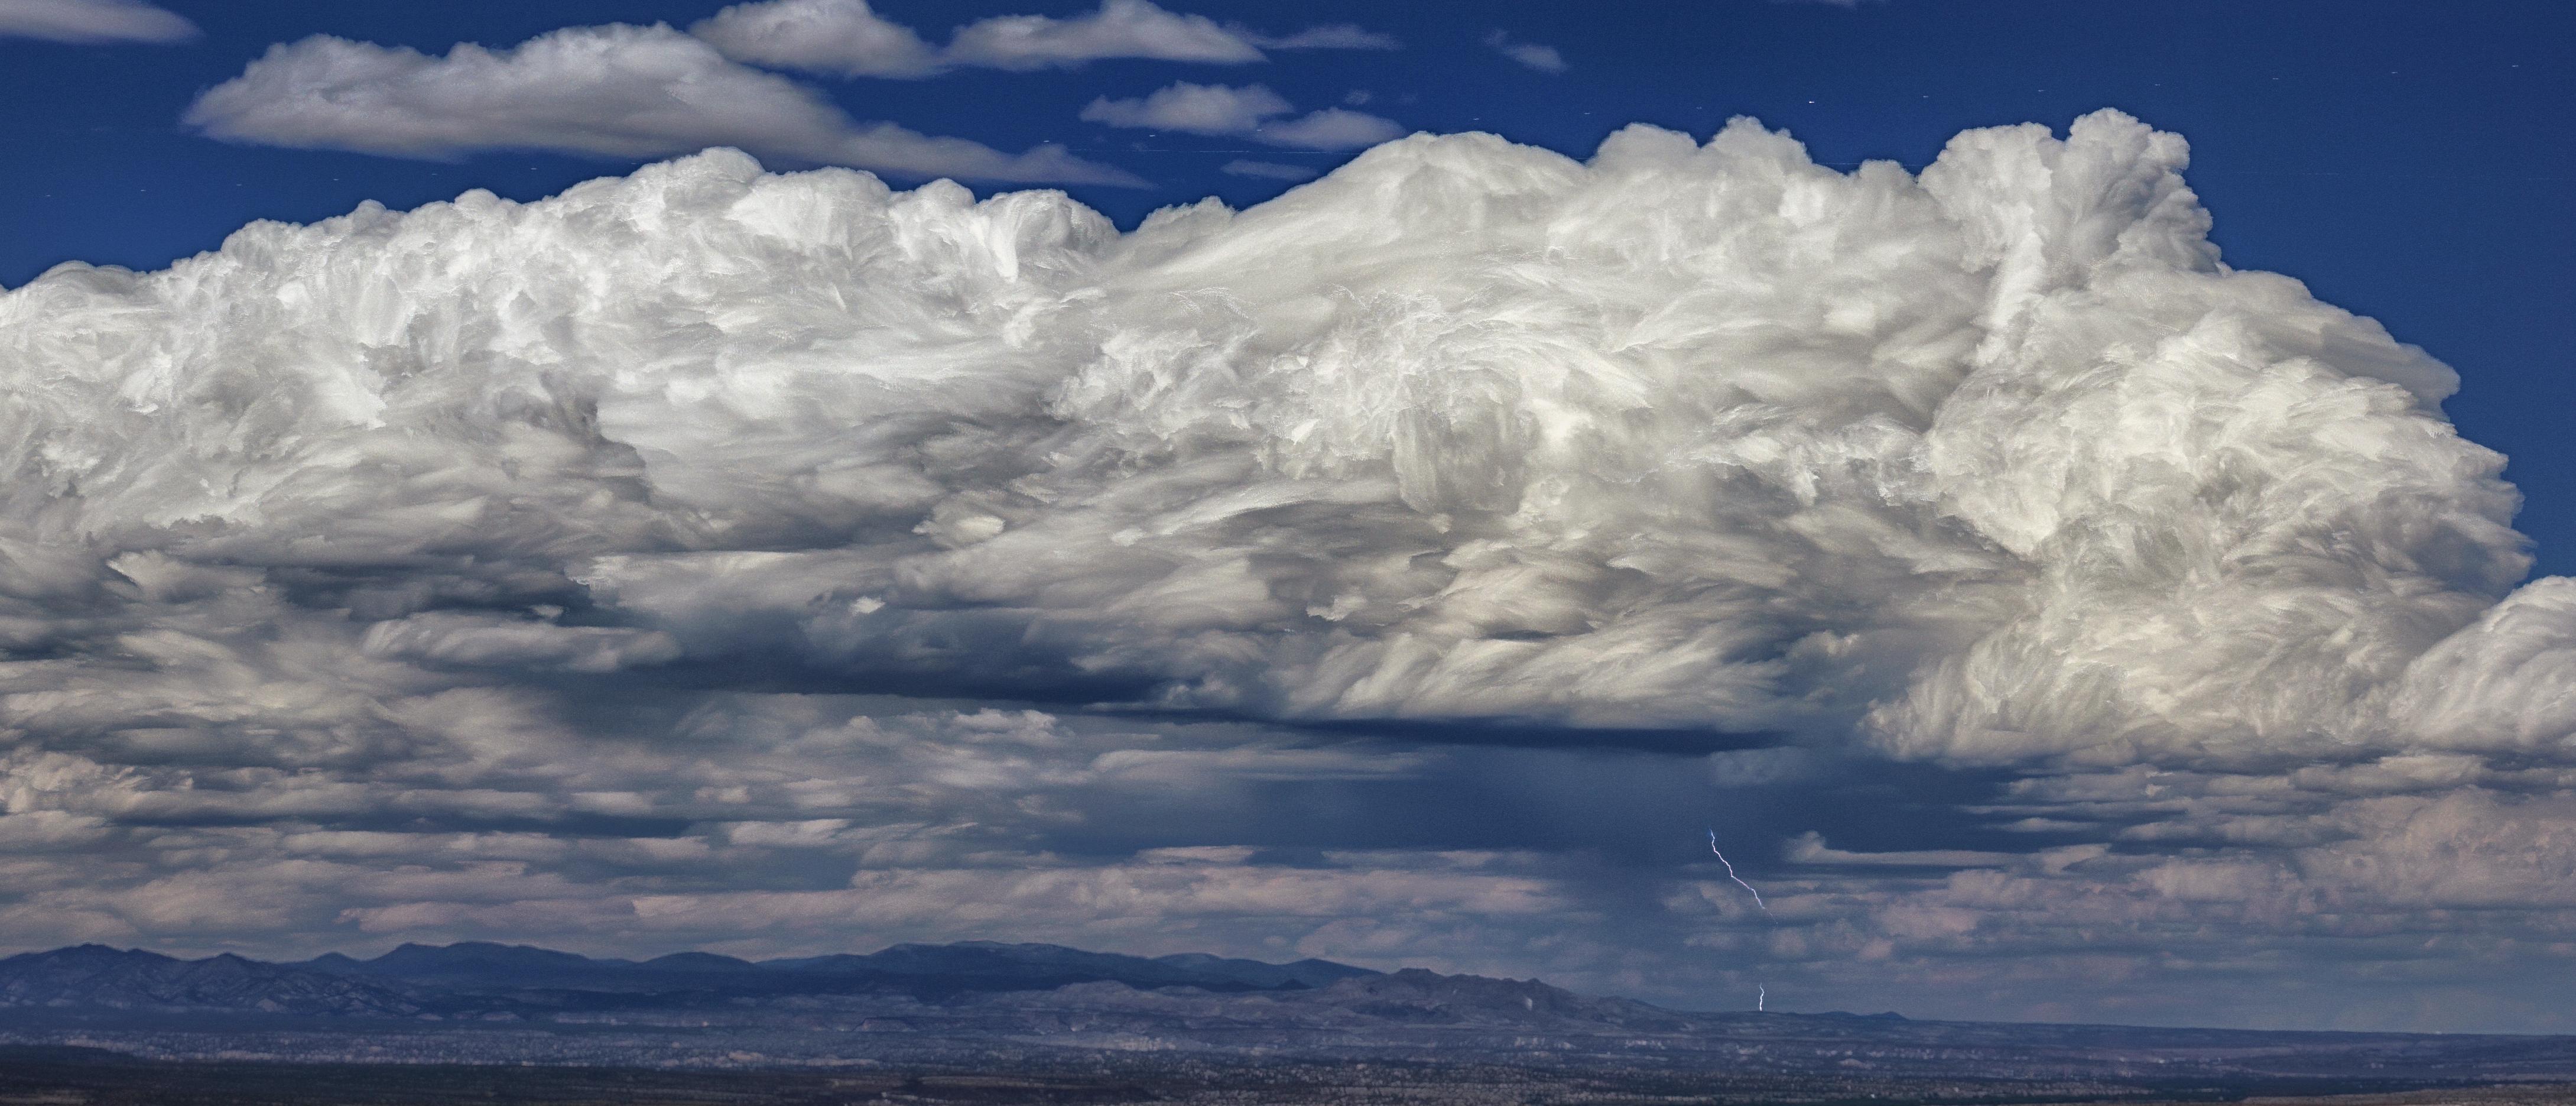 Облака и снег картинка